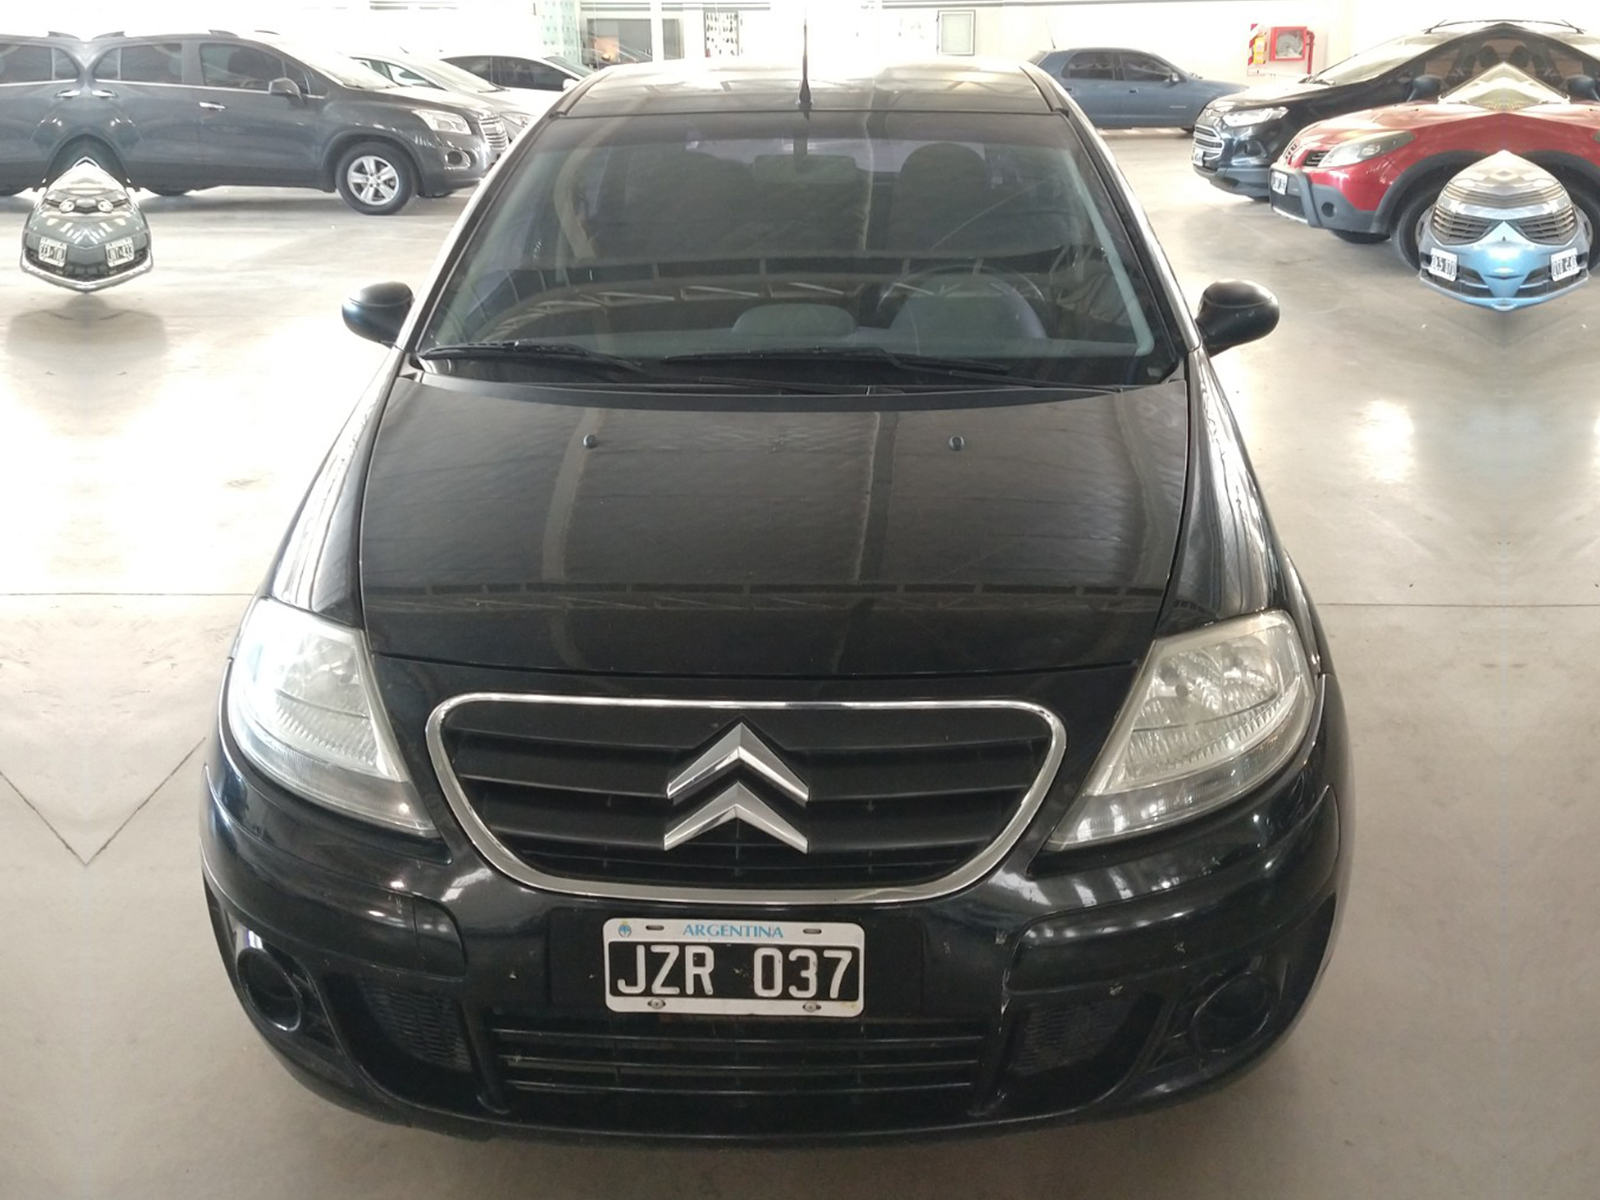 2011 CITROEN C3 SX 1,4